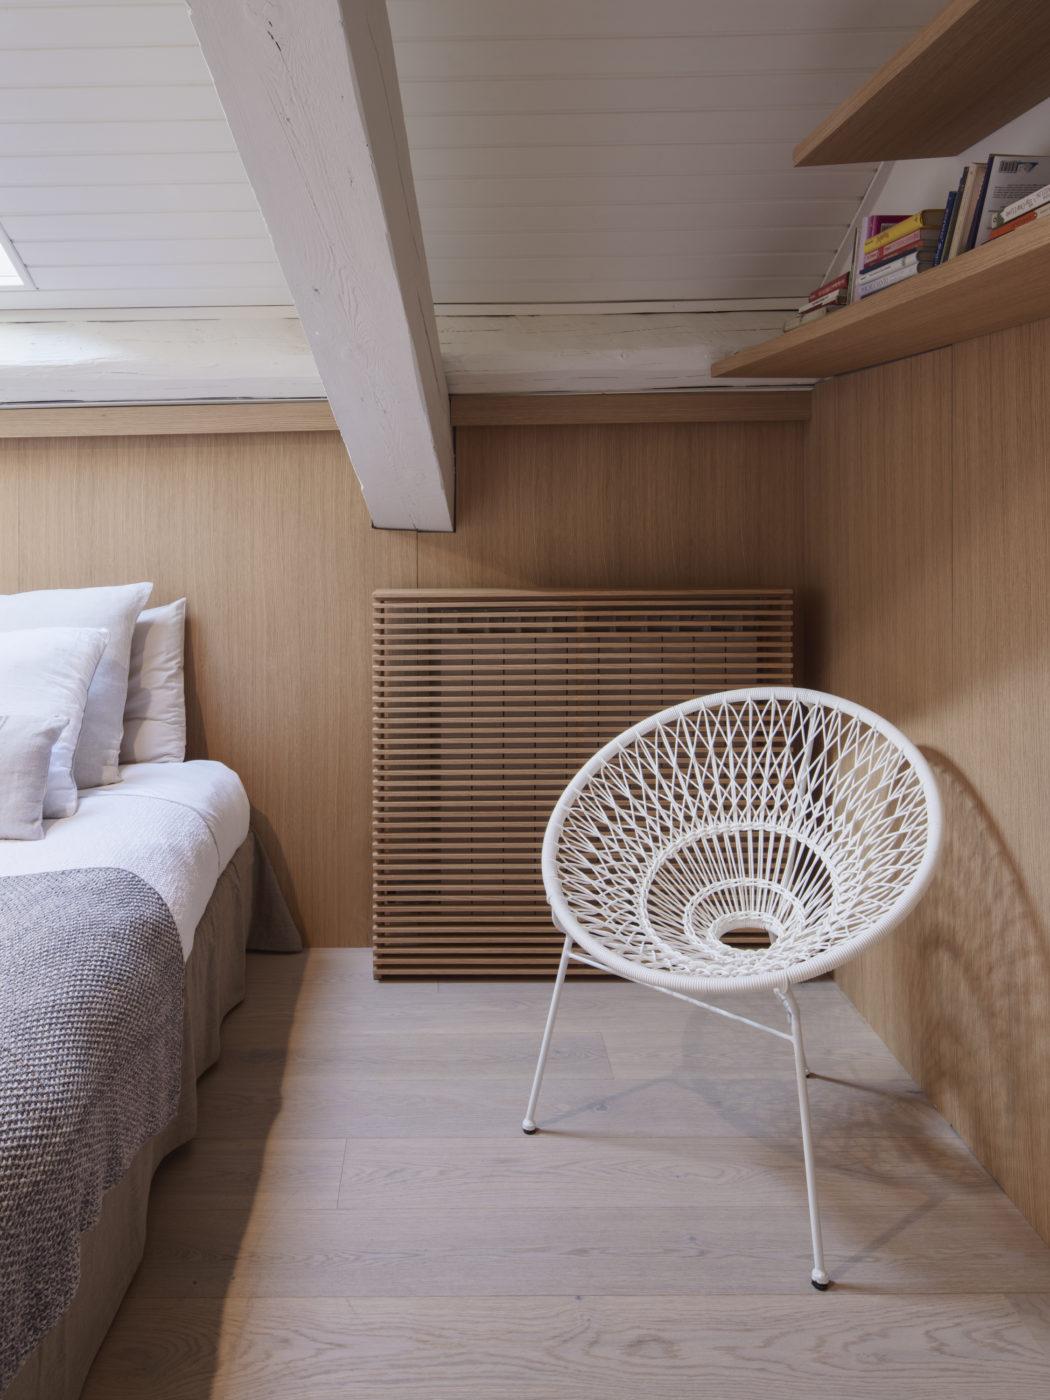 zolderslaapkamer-met-mooie-houten-wandbekleding